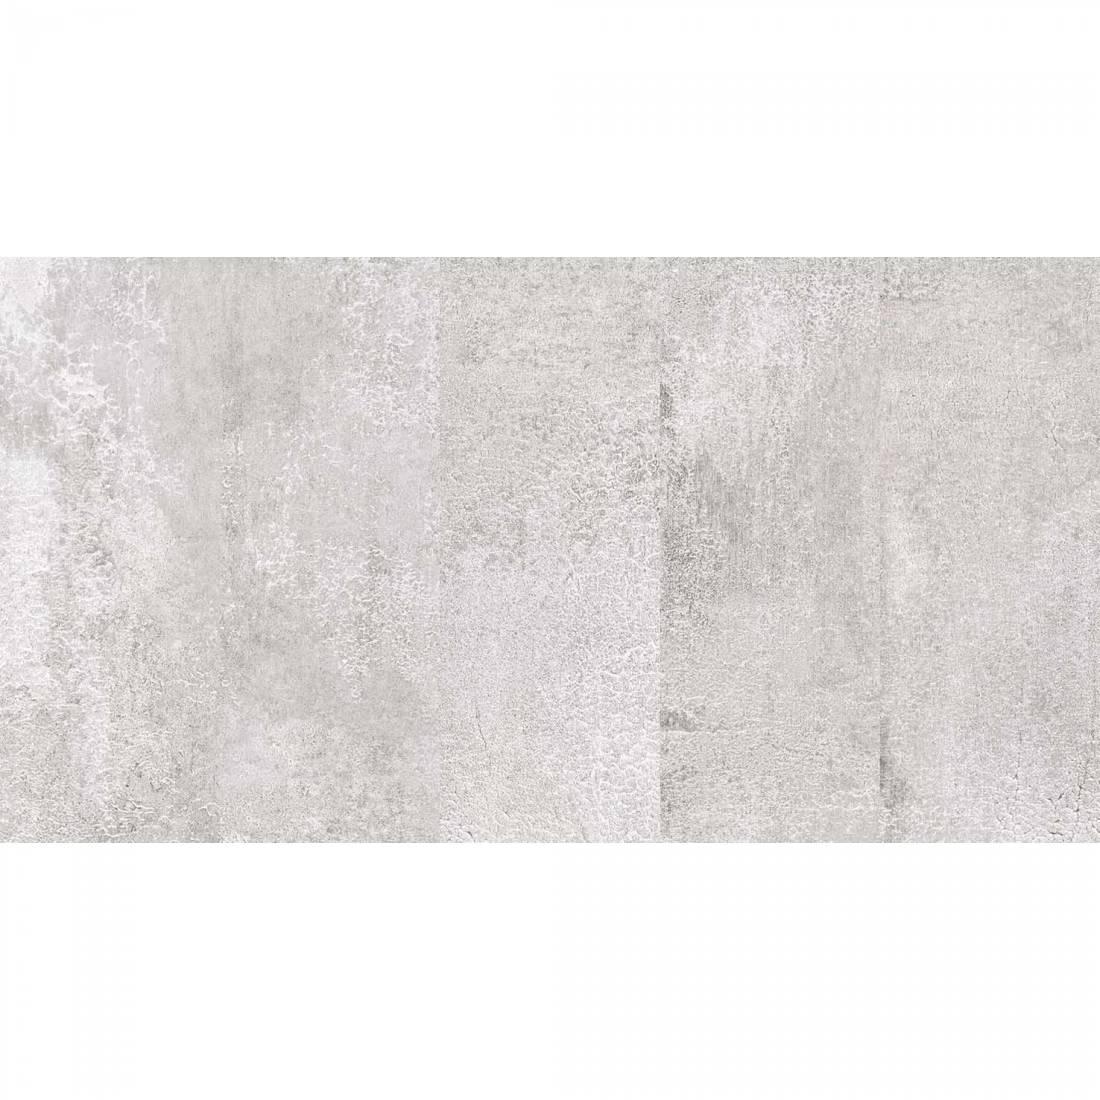 Wald 20x60 Silver Matt 1